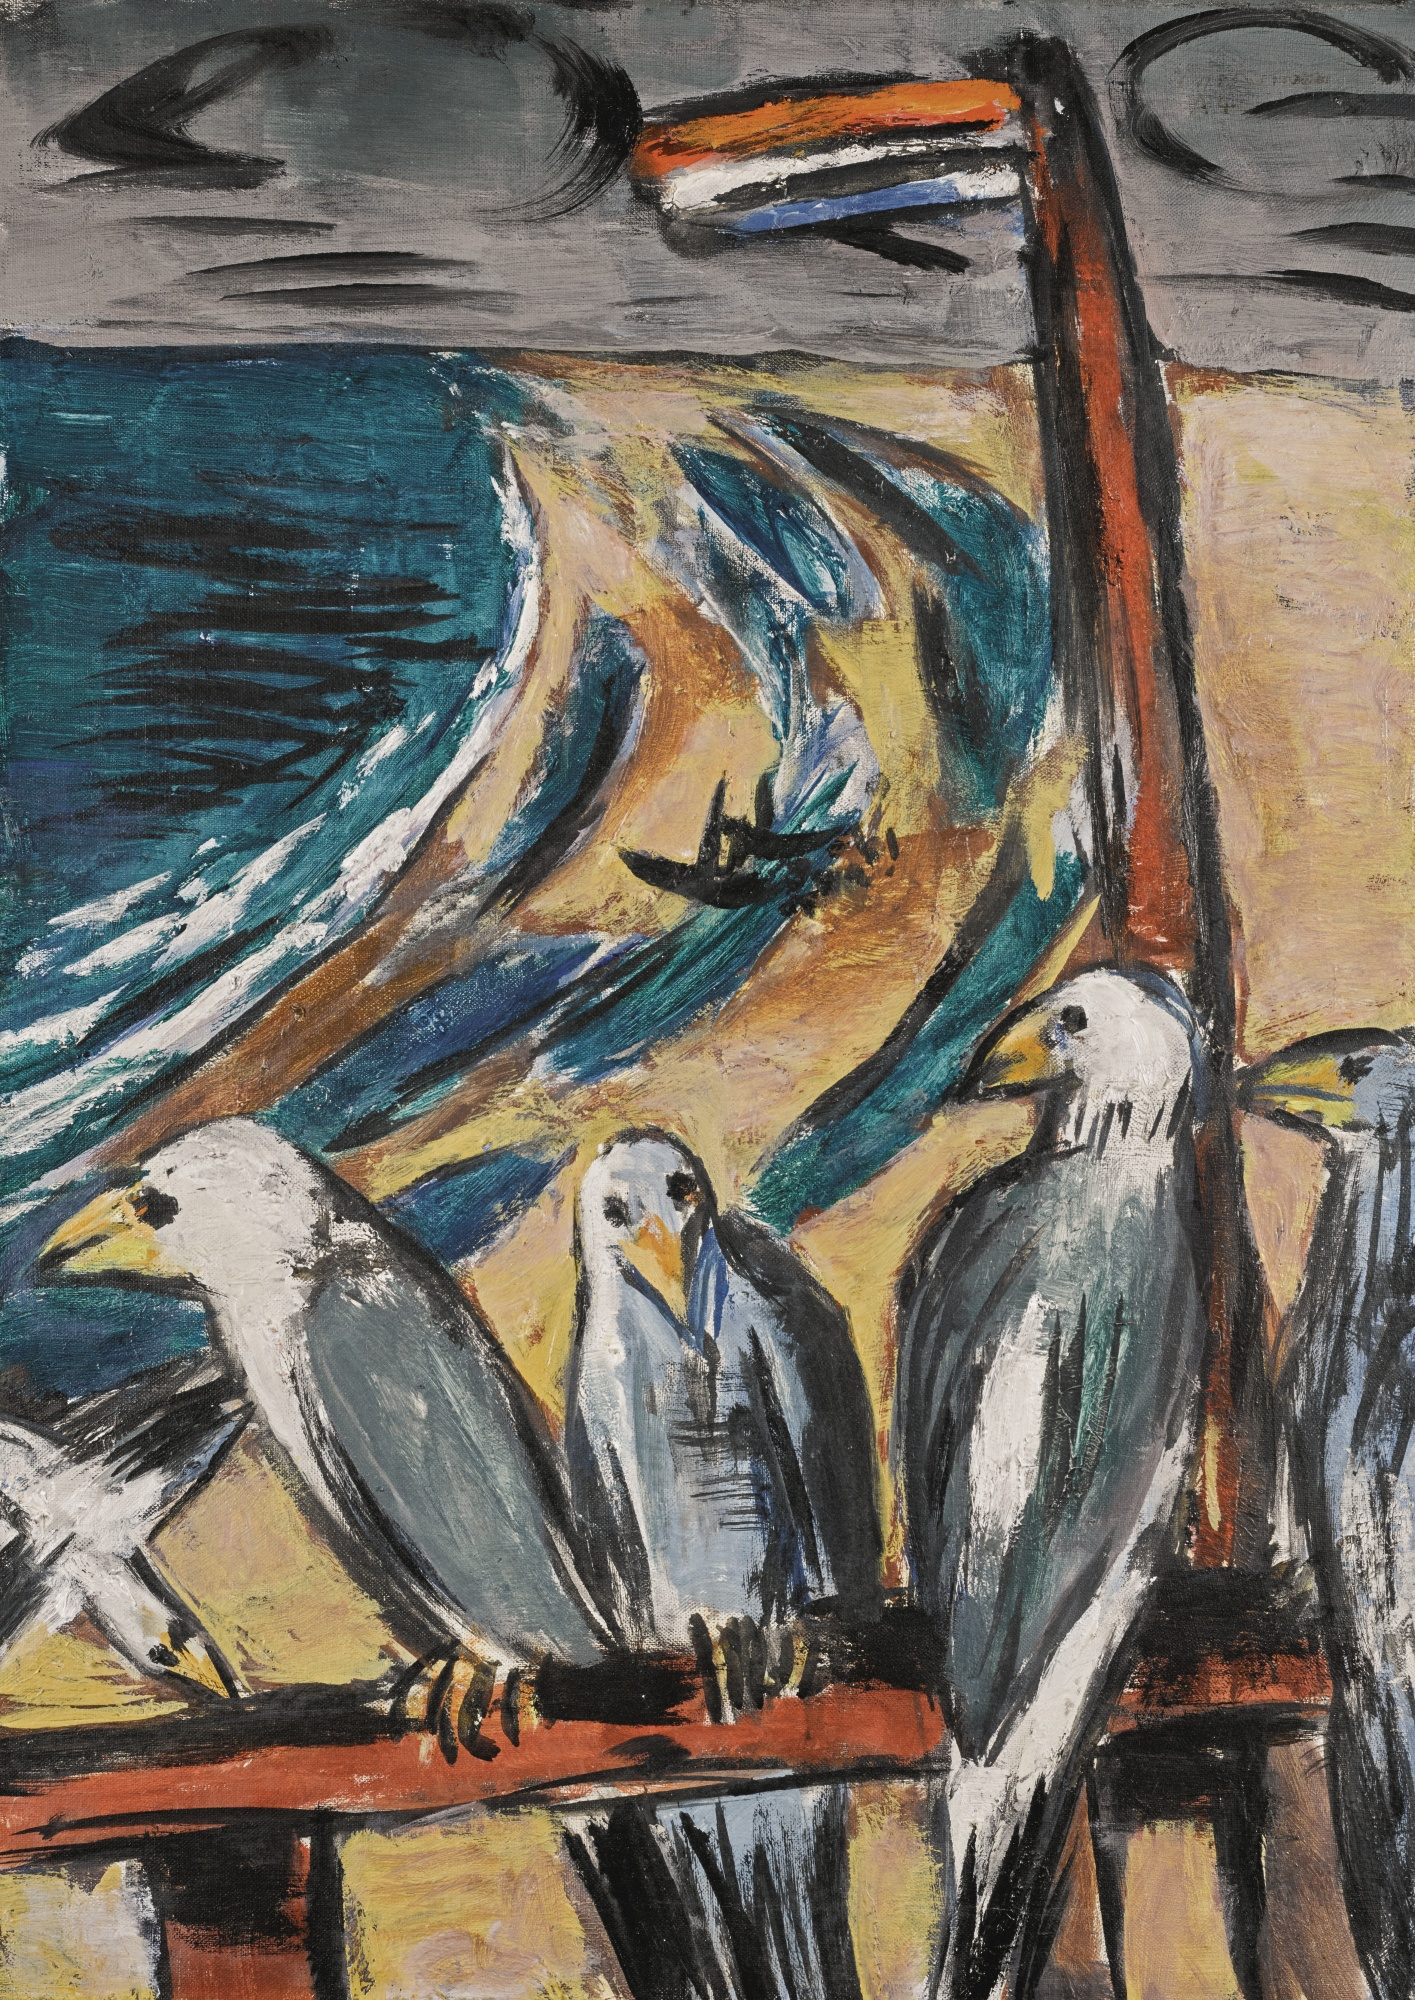 Max Beckmann-Mowen Im Sturm (Seagulls In The Storm)-1942